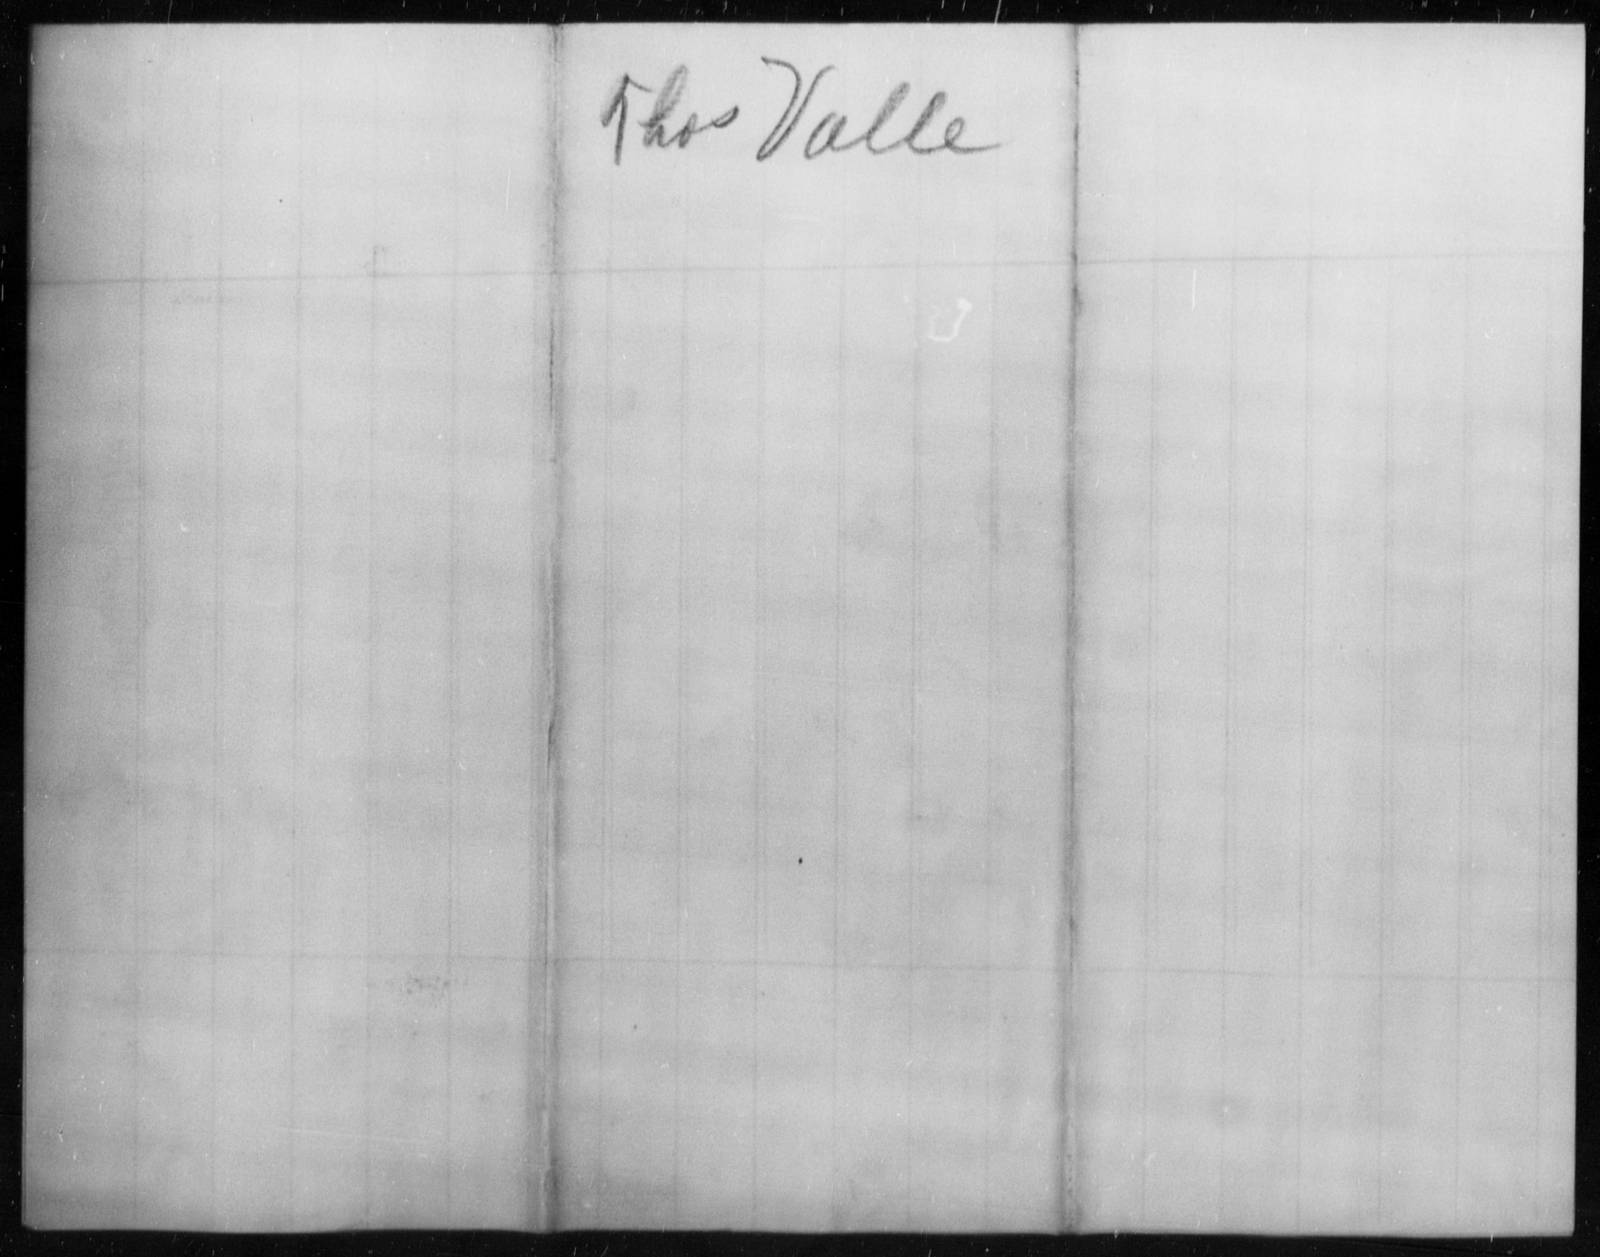 Valle, Thos - State: [Blank] - Year: [Blank]